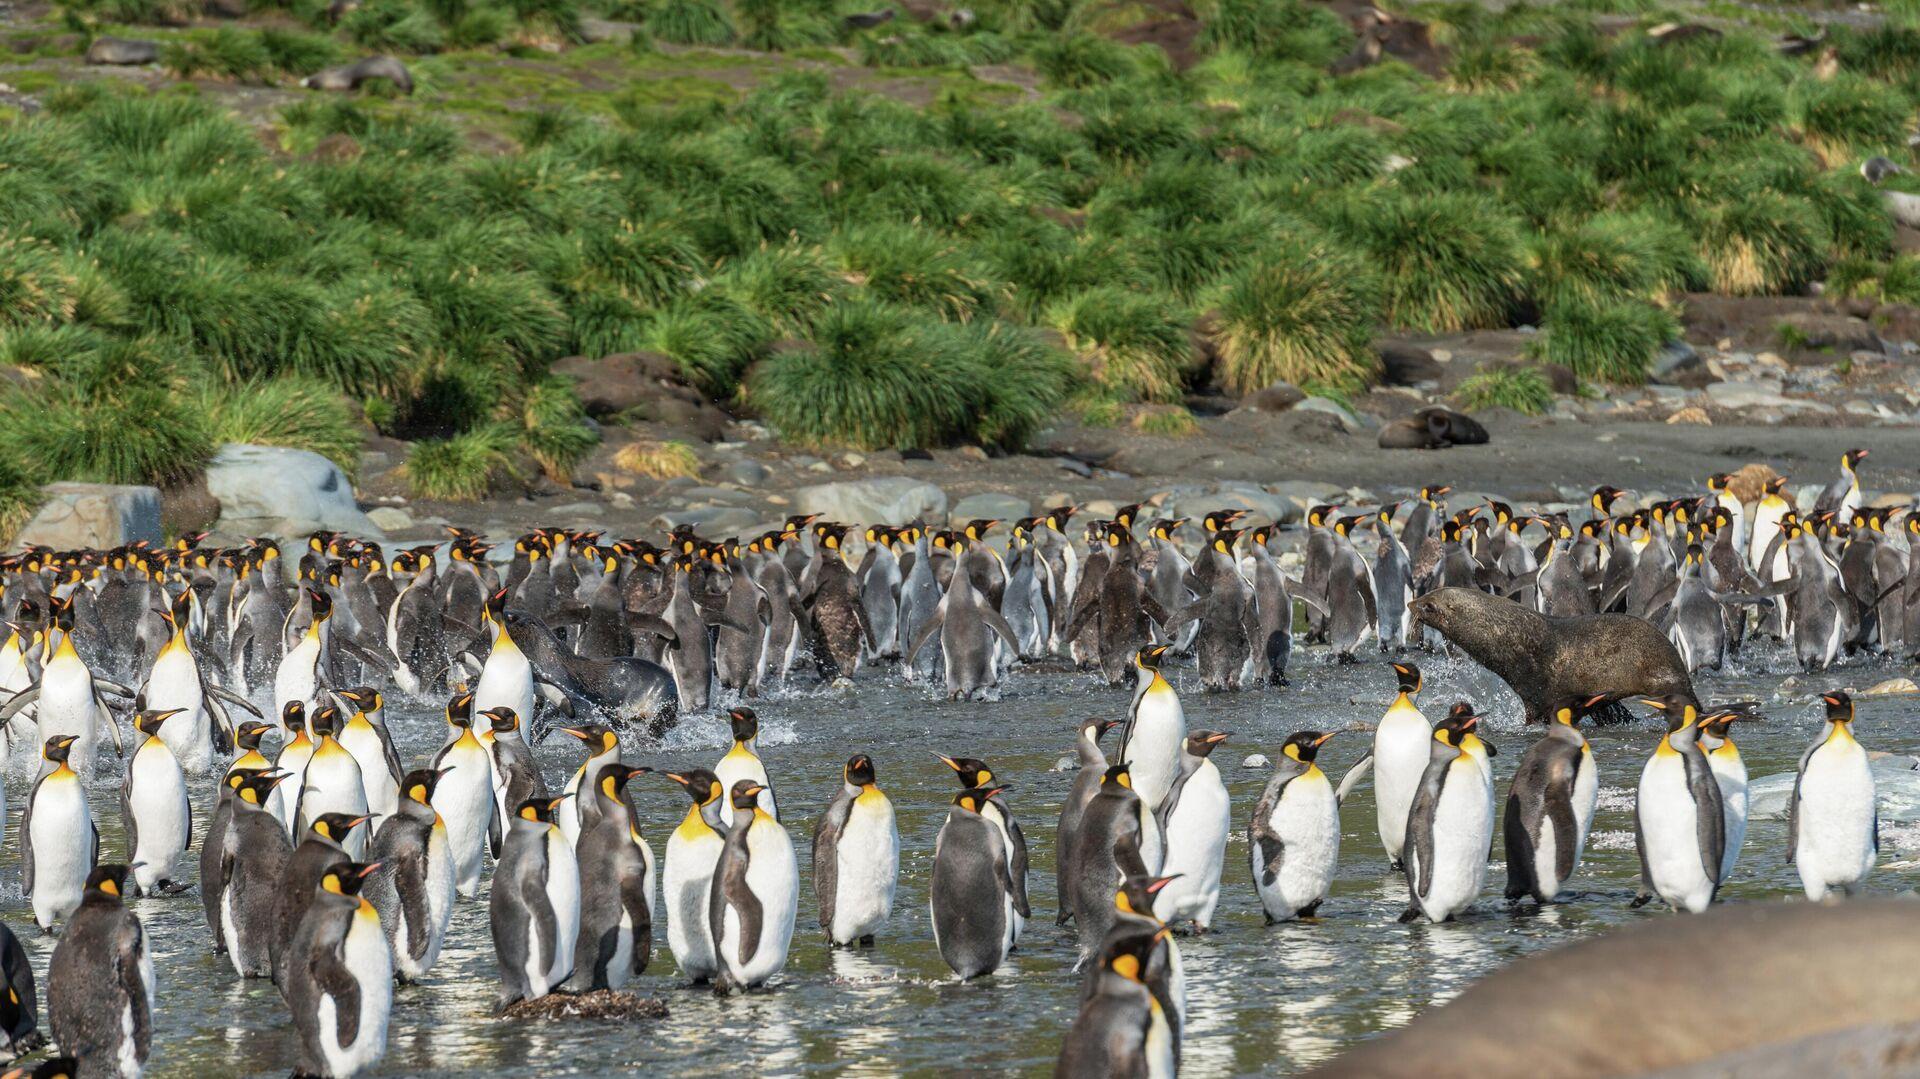 Una colonia de pingüinos rey - Sputnik Mundo, 1920, 21.02.2021